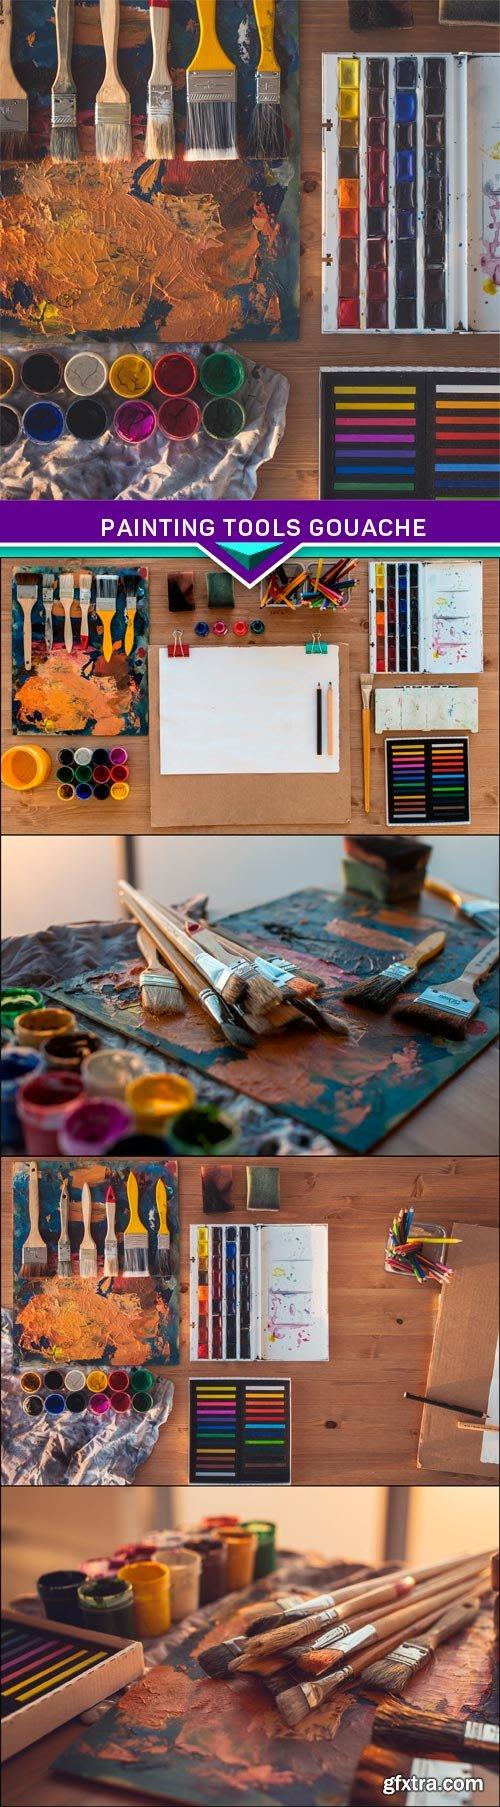 Painting tools gouache, watercolor and brush in art studio 5X JPEG